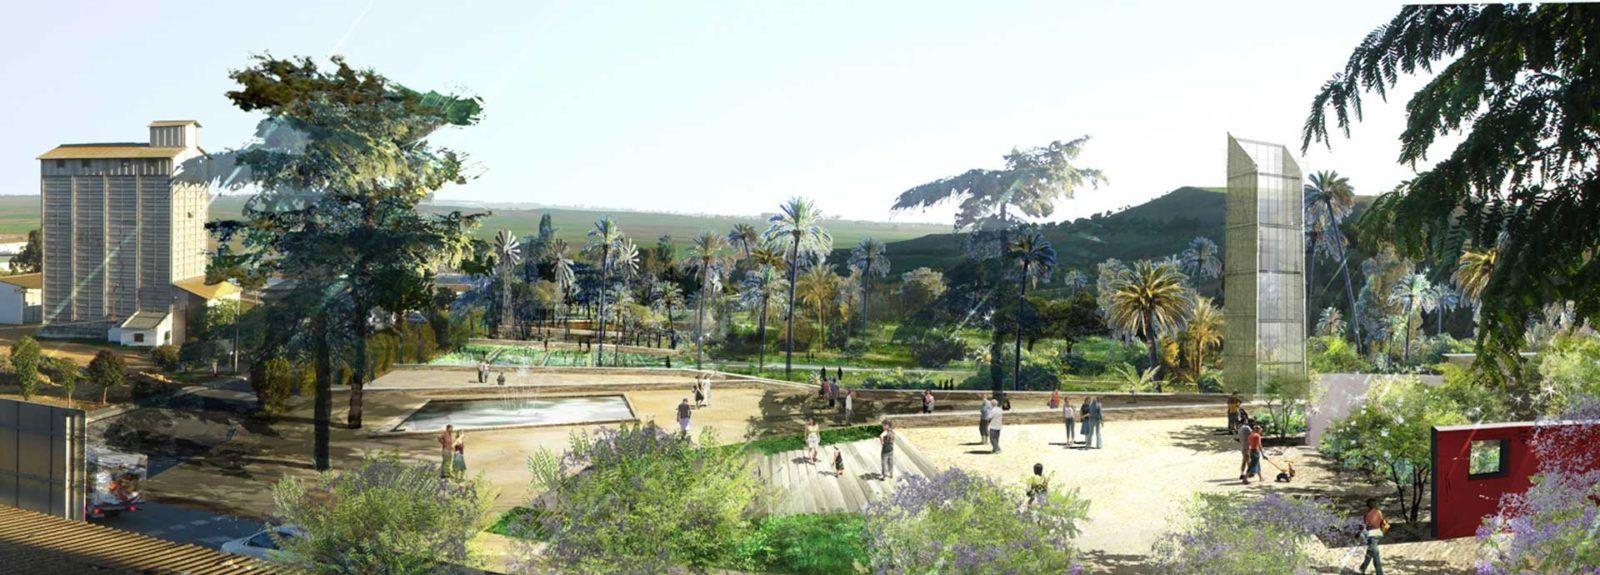 Parc de la Muela - Mutabilis